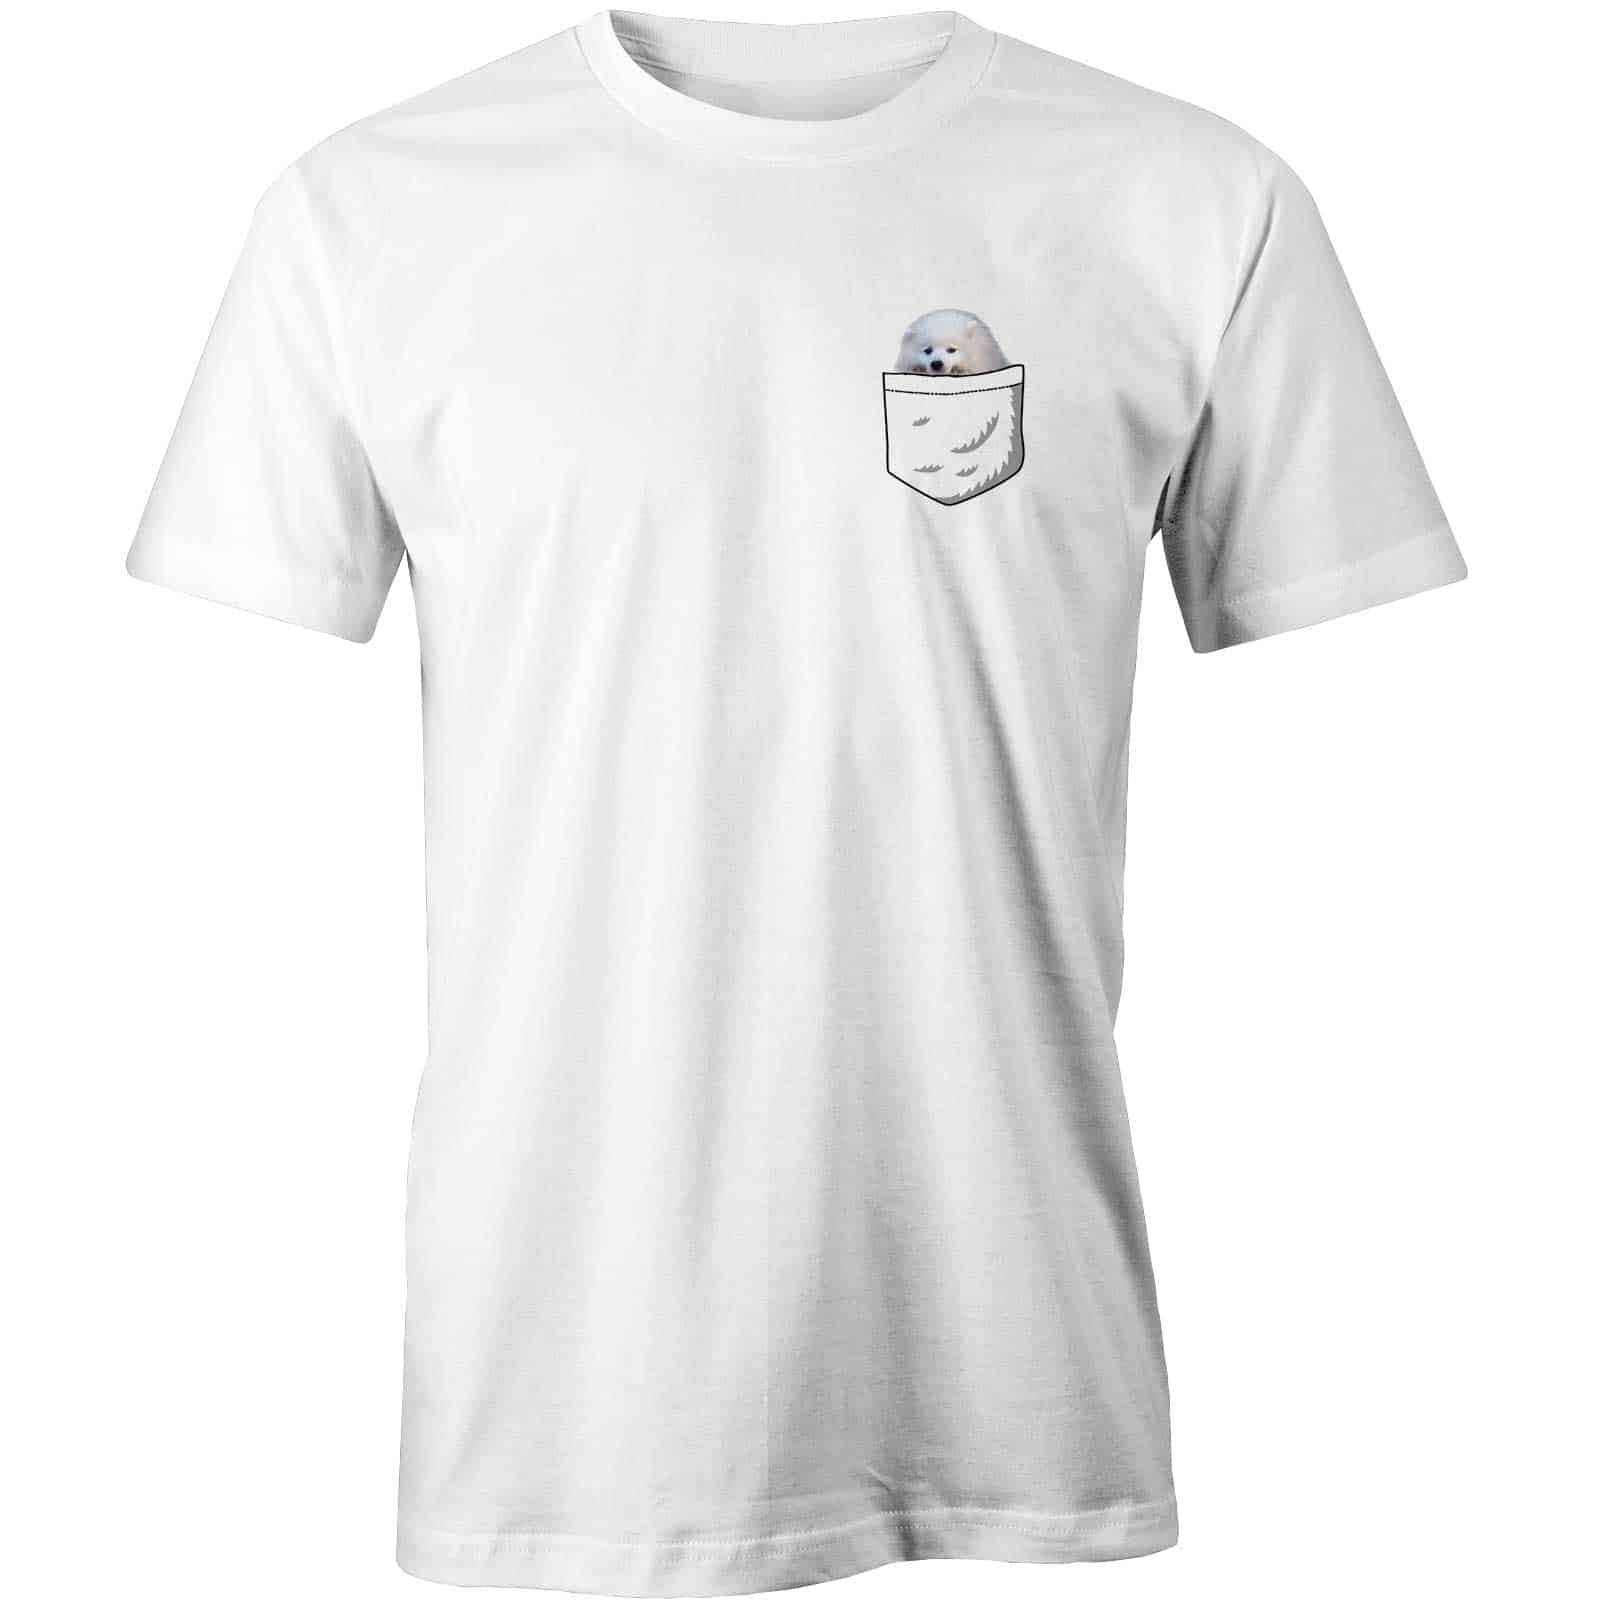 OGO Pocket Print T-shirt